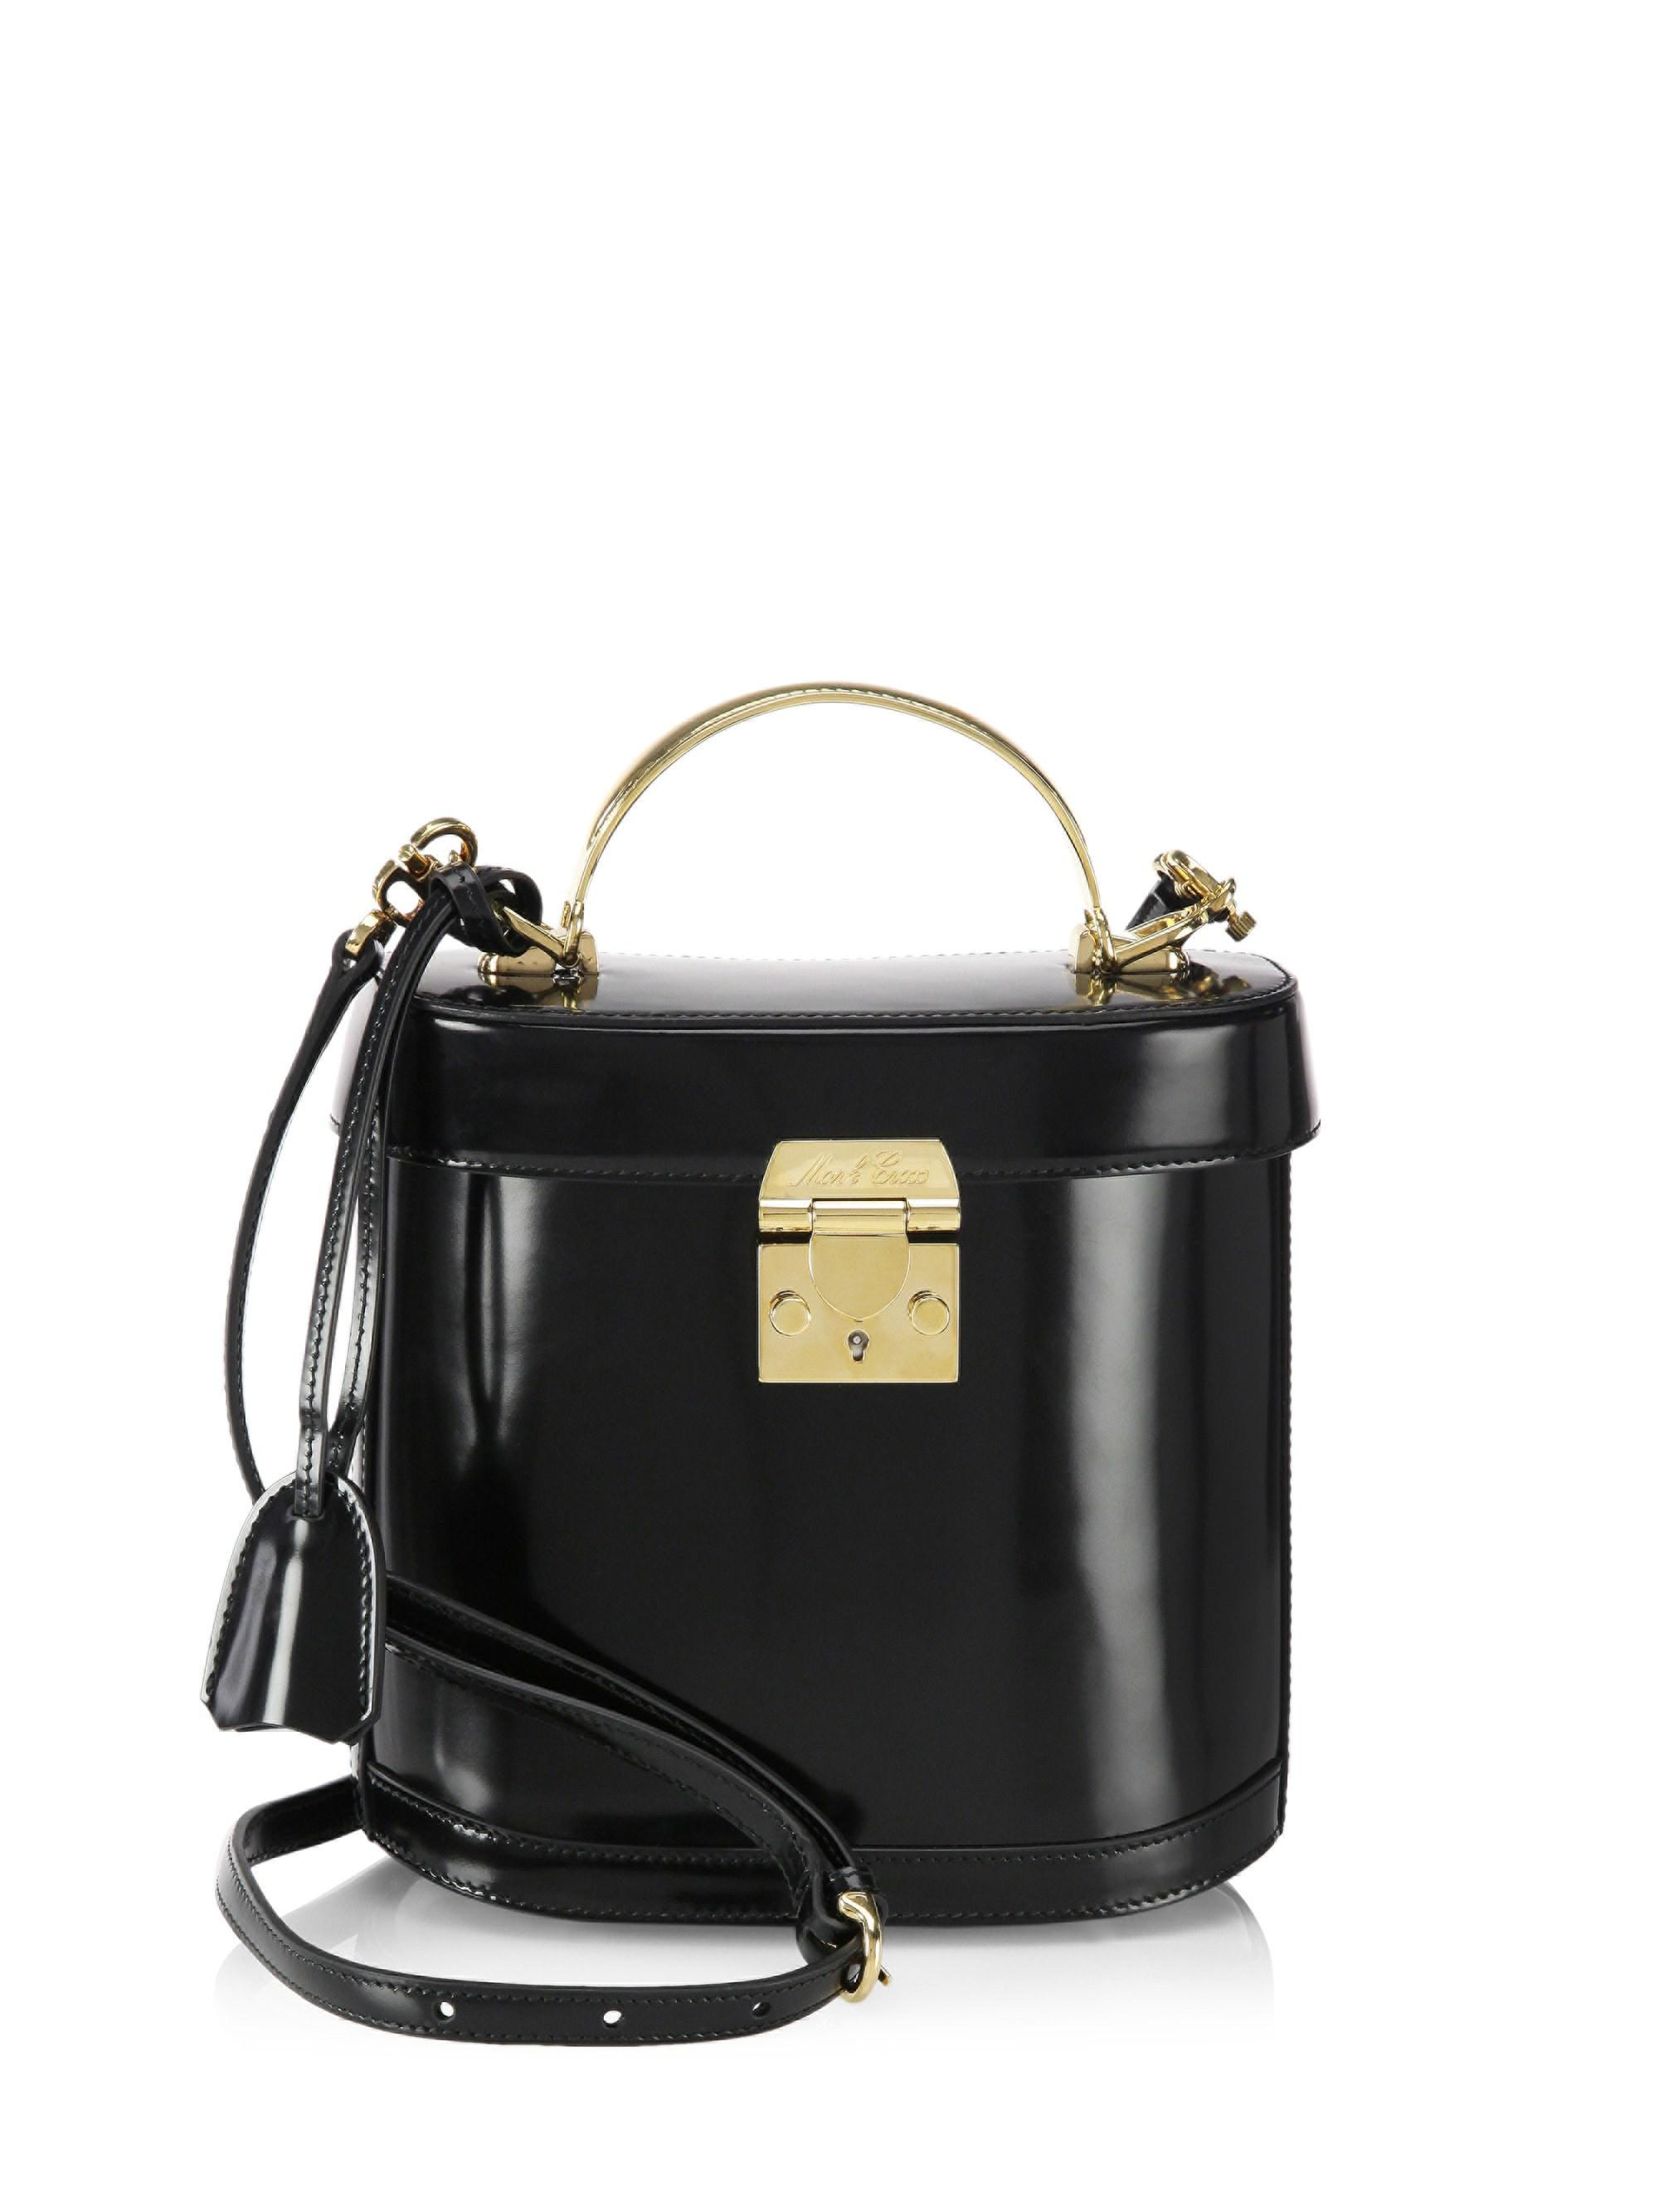 Mark Cross Benchley Leather Crossbody Bag in Black - Lyst 512c8b9290